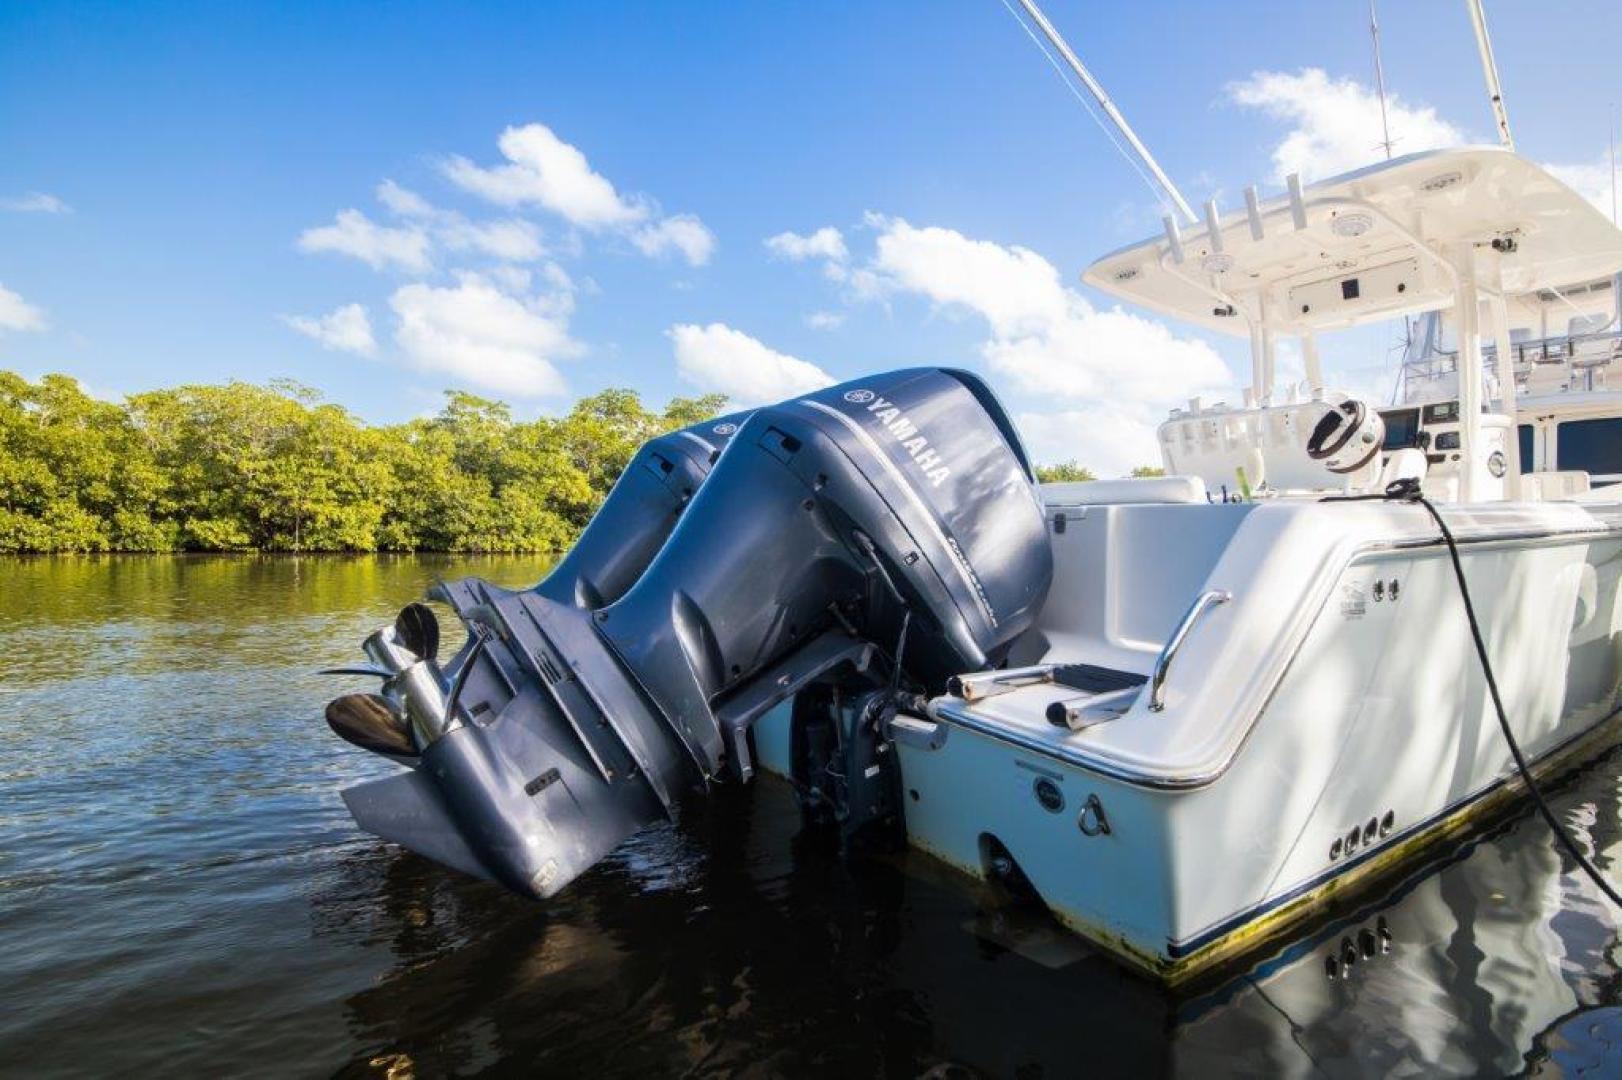 Sea Hunt-Gamefisherman 2013-No Name 29 Sea Hunt Key Largo-Florida-United States-Engines-1562276 | Thumbnail